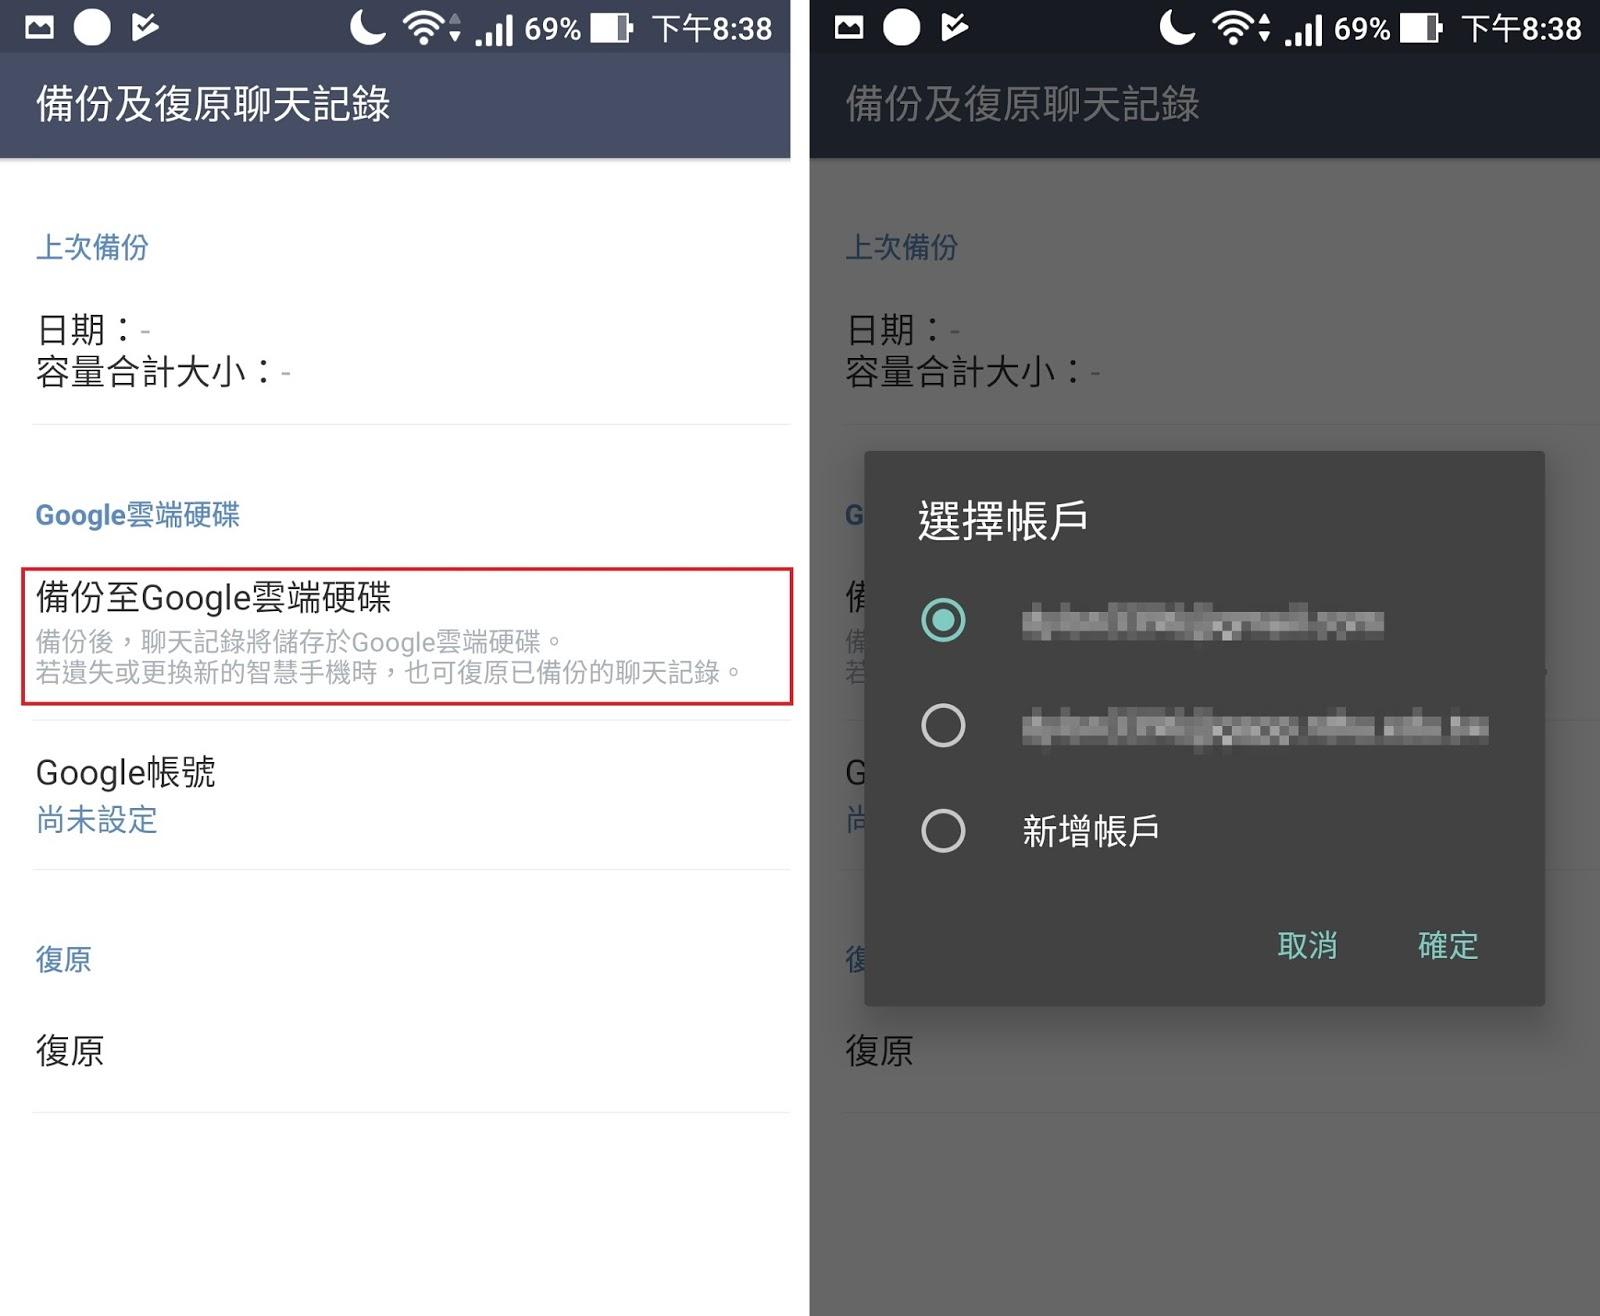 Screenshot 20170531 203831 - [教學] Line 終於開放 Android 使用者「雲端備份」聊天紀錄!趕快來更新吧!